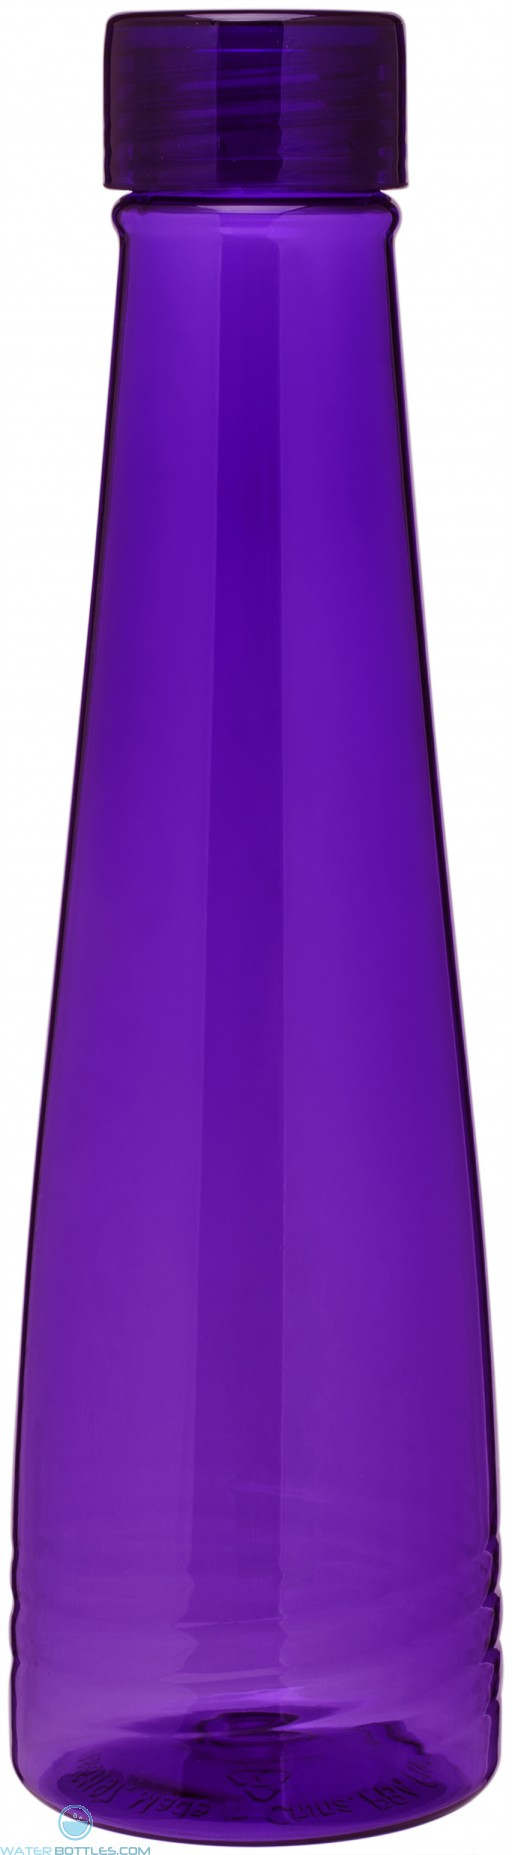 H2Go Splash | 20 oz-Purple